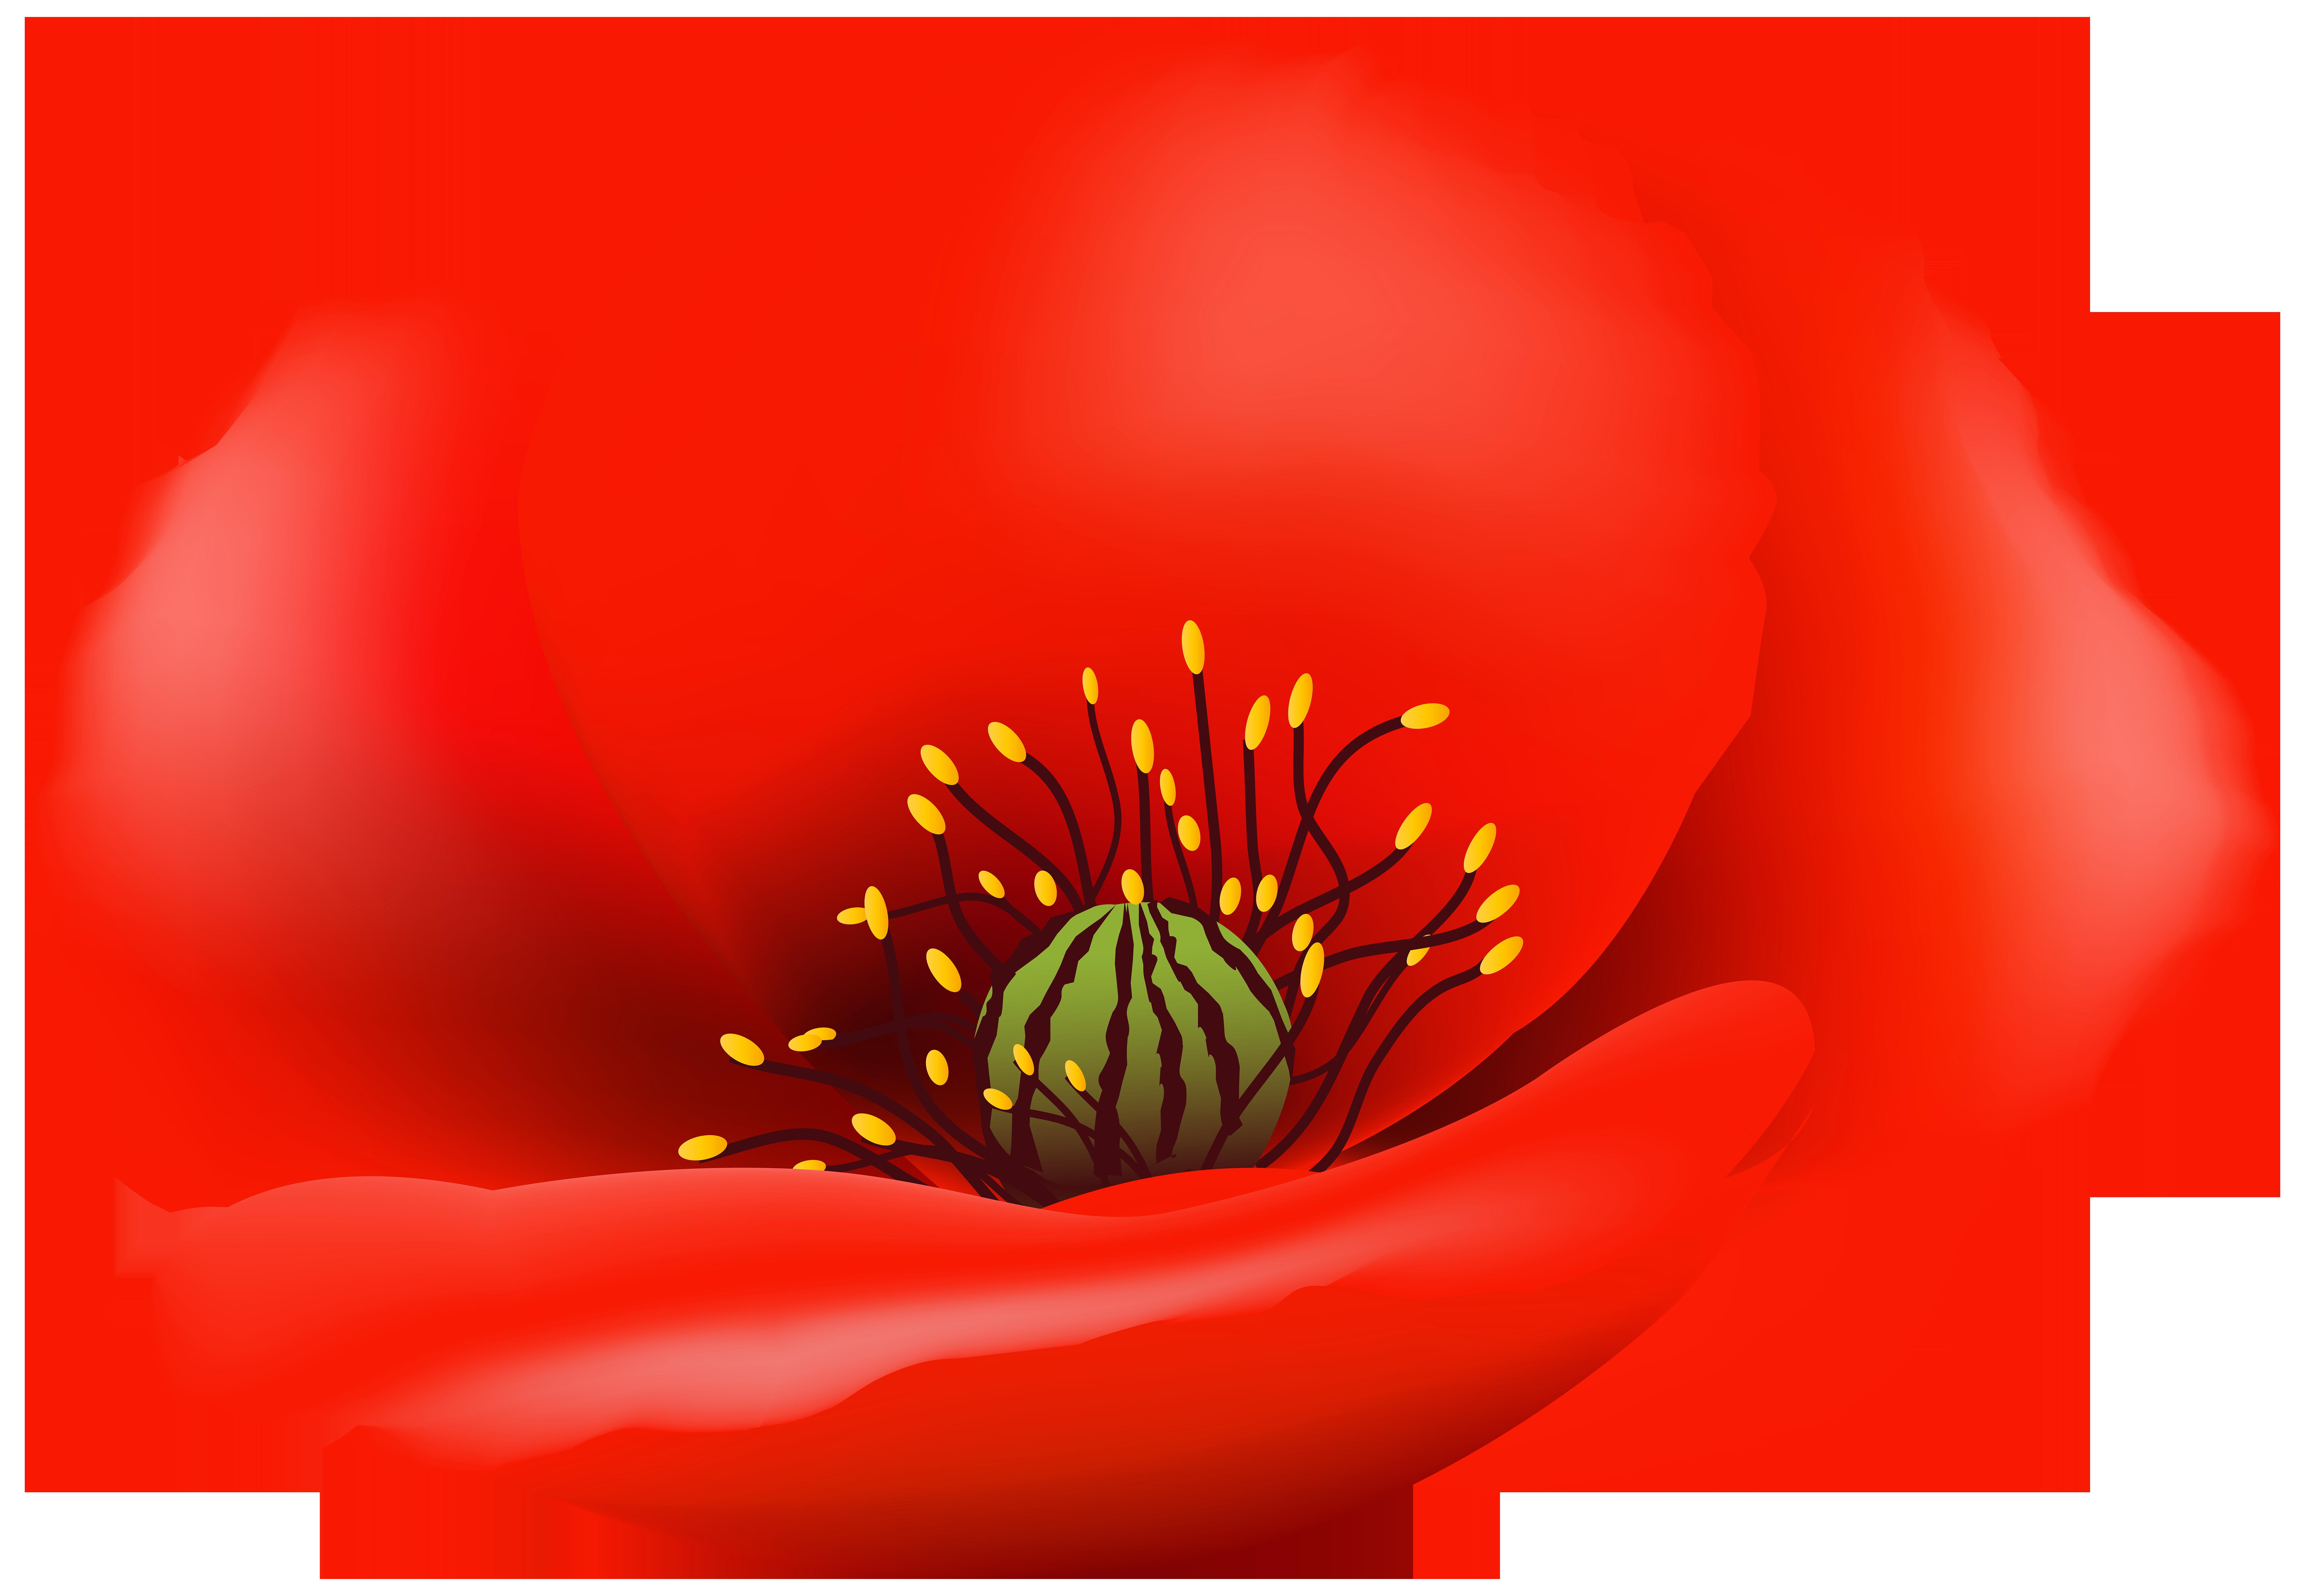 Poppy clipart transparent background. Flower png clip art